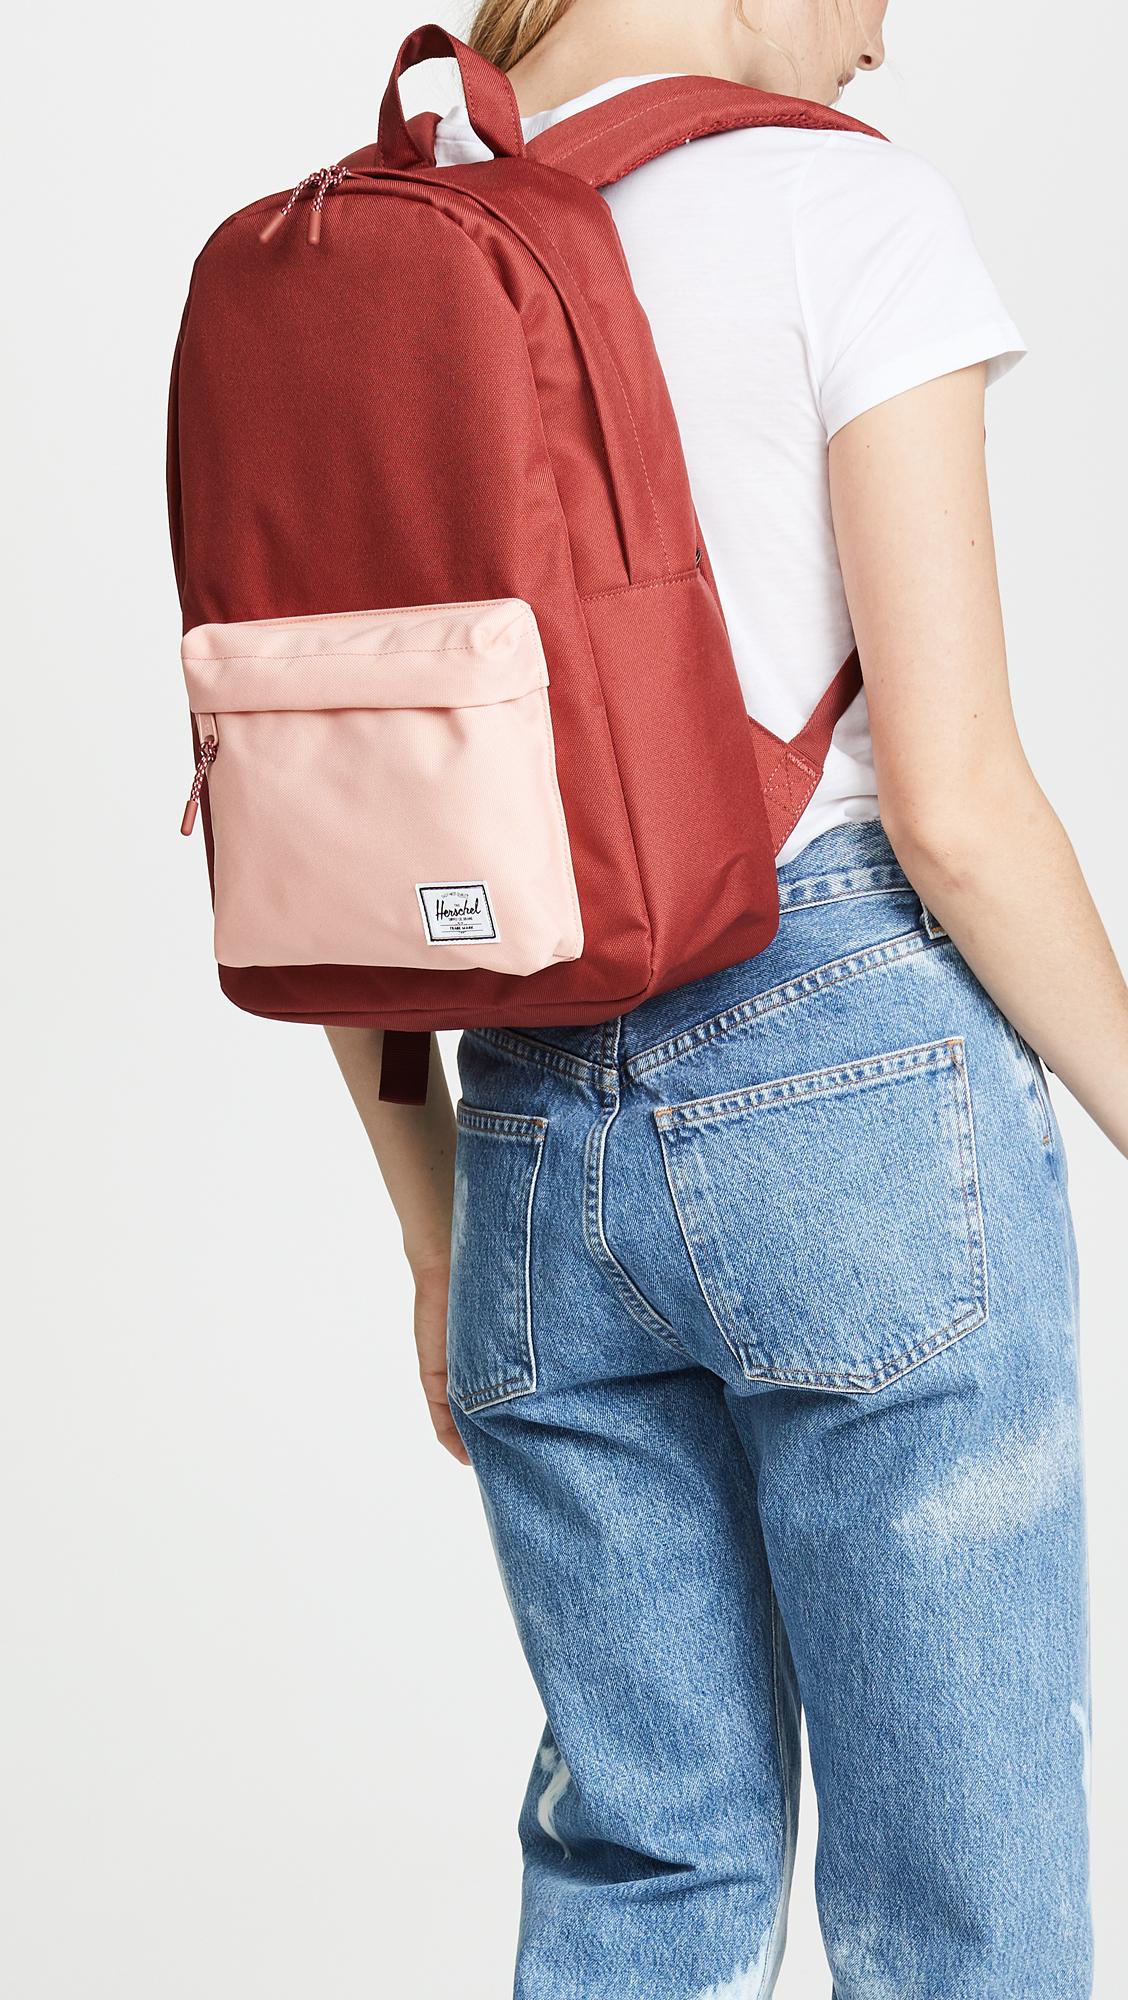 570764235fb Herschel Supply Co. Classic Mid Volume Backpack